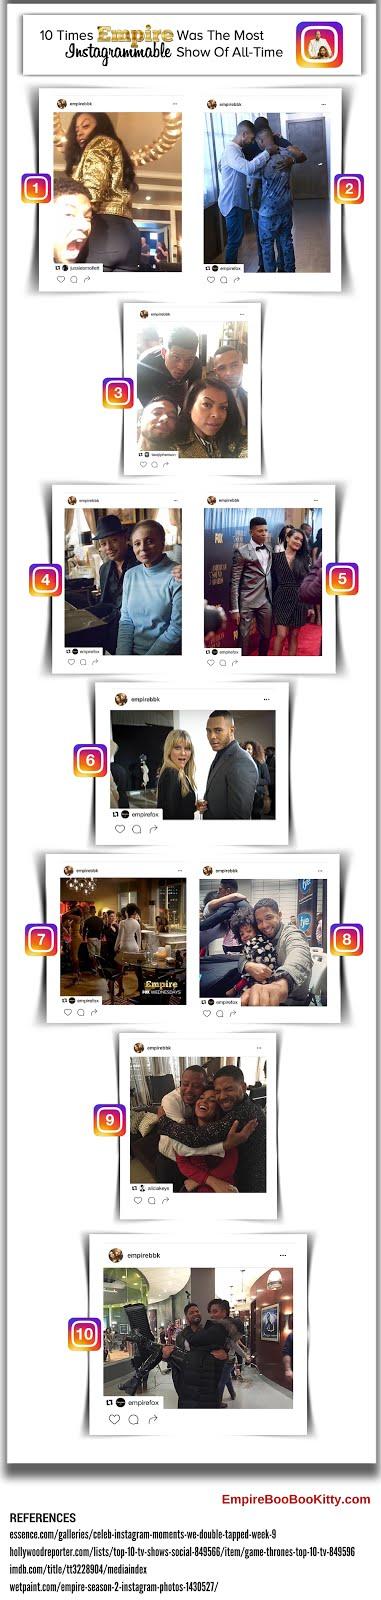 Empire Fox Instagram Infographic